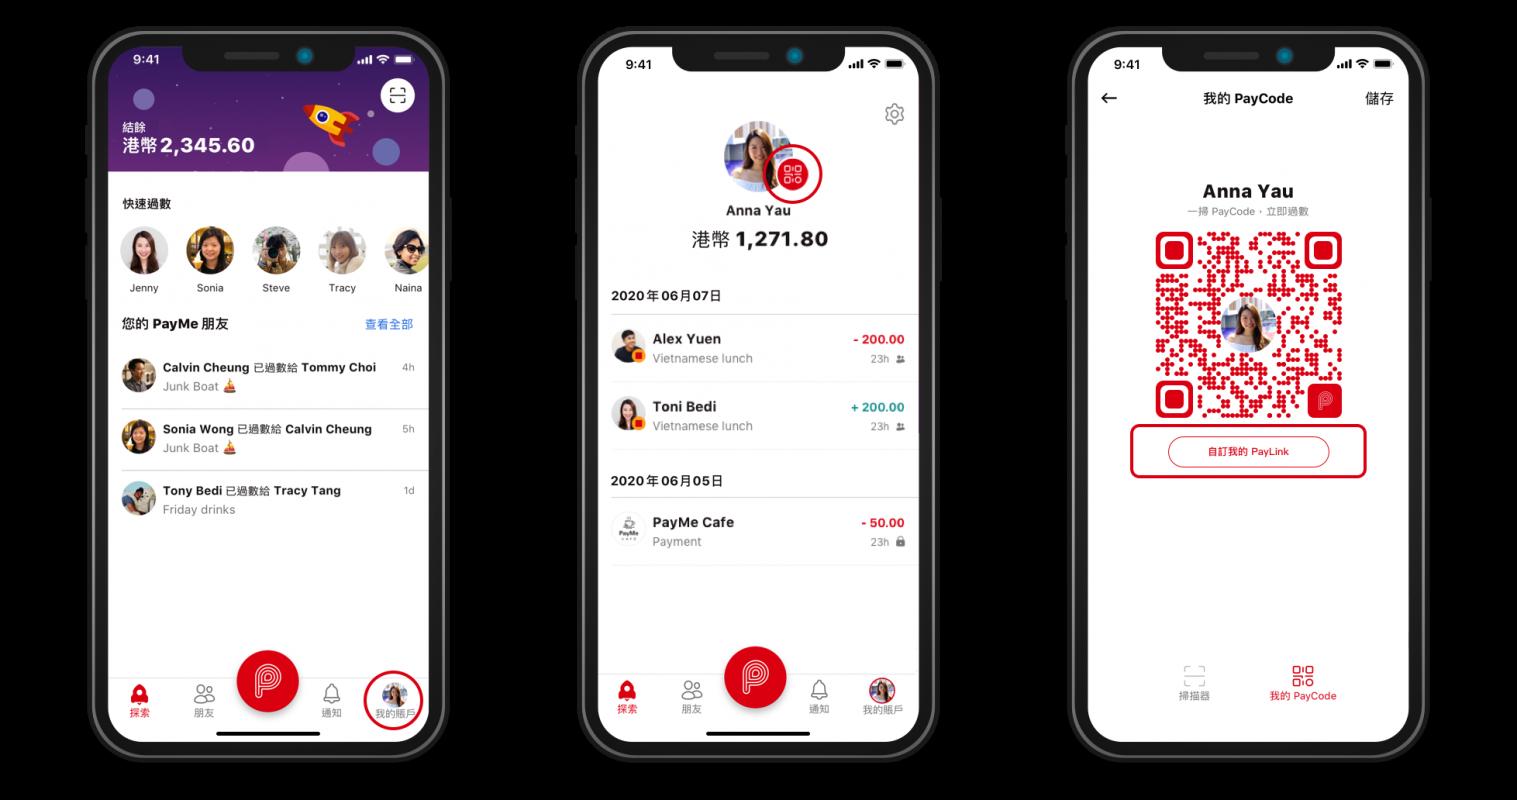 【PayMe】 增值、轉賬、最新商戶優惠 (2021-07-28更新)